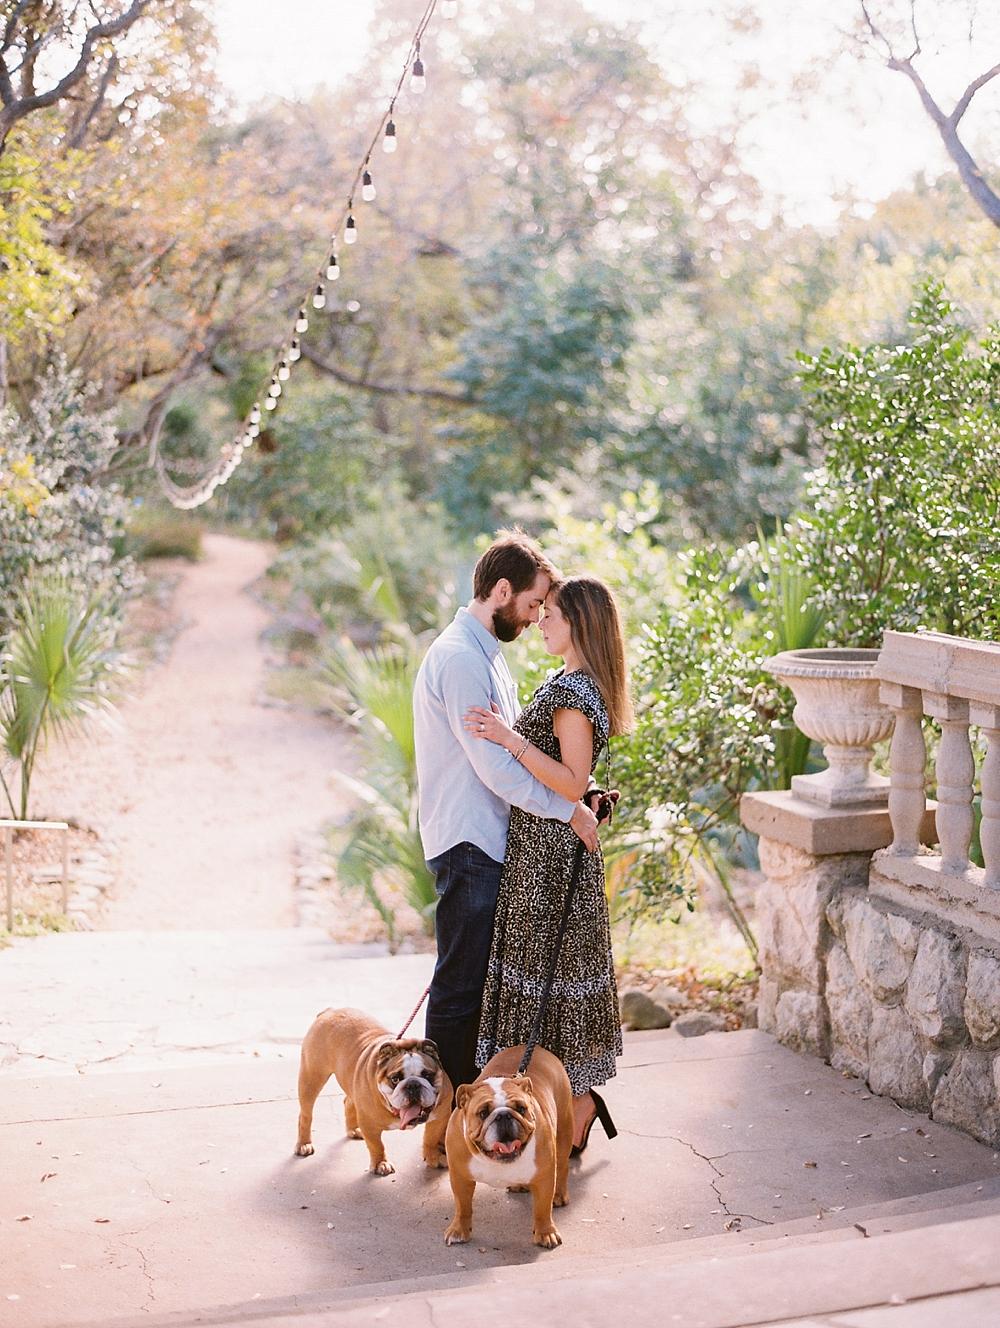 kristin-la-voie-photography-Austin-Wedding-Photographer-laguna-gloria-commodore-perry-estate-engagement-126